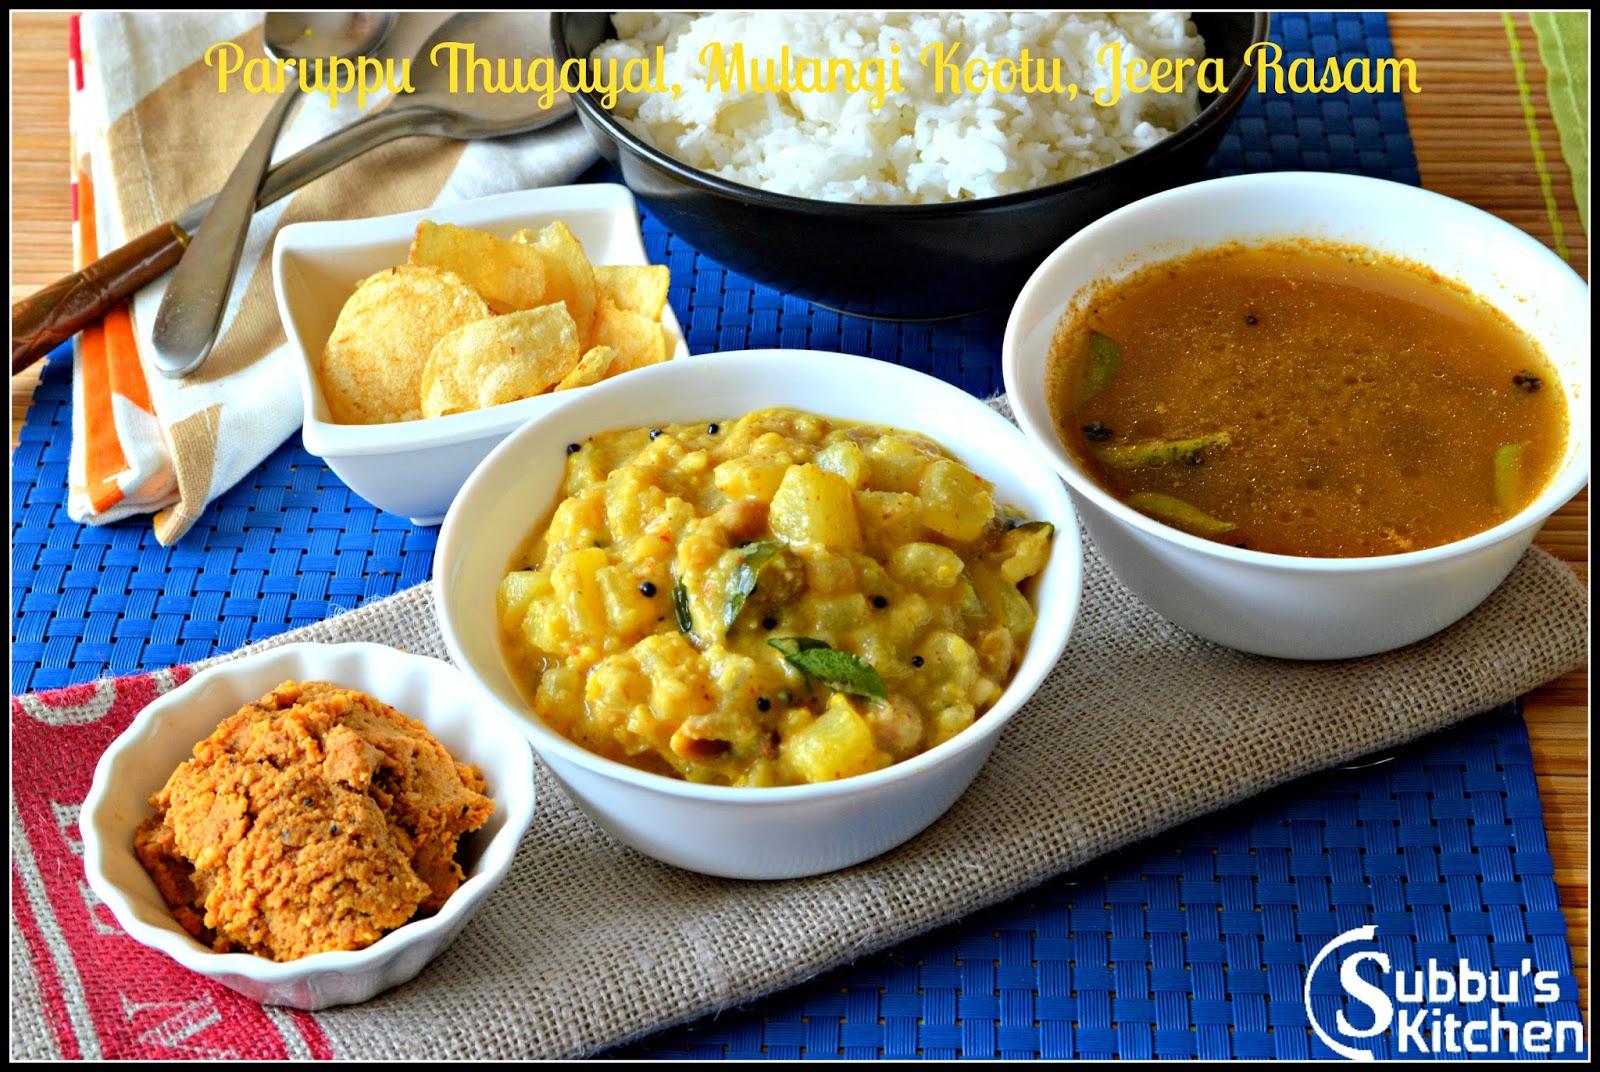 SouthIndian Lunch Menu  2 - Paruppu Thugayal, Jeera Rasam and Mullangi Rasam